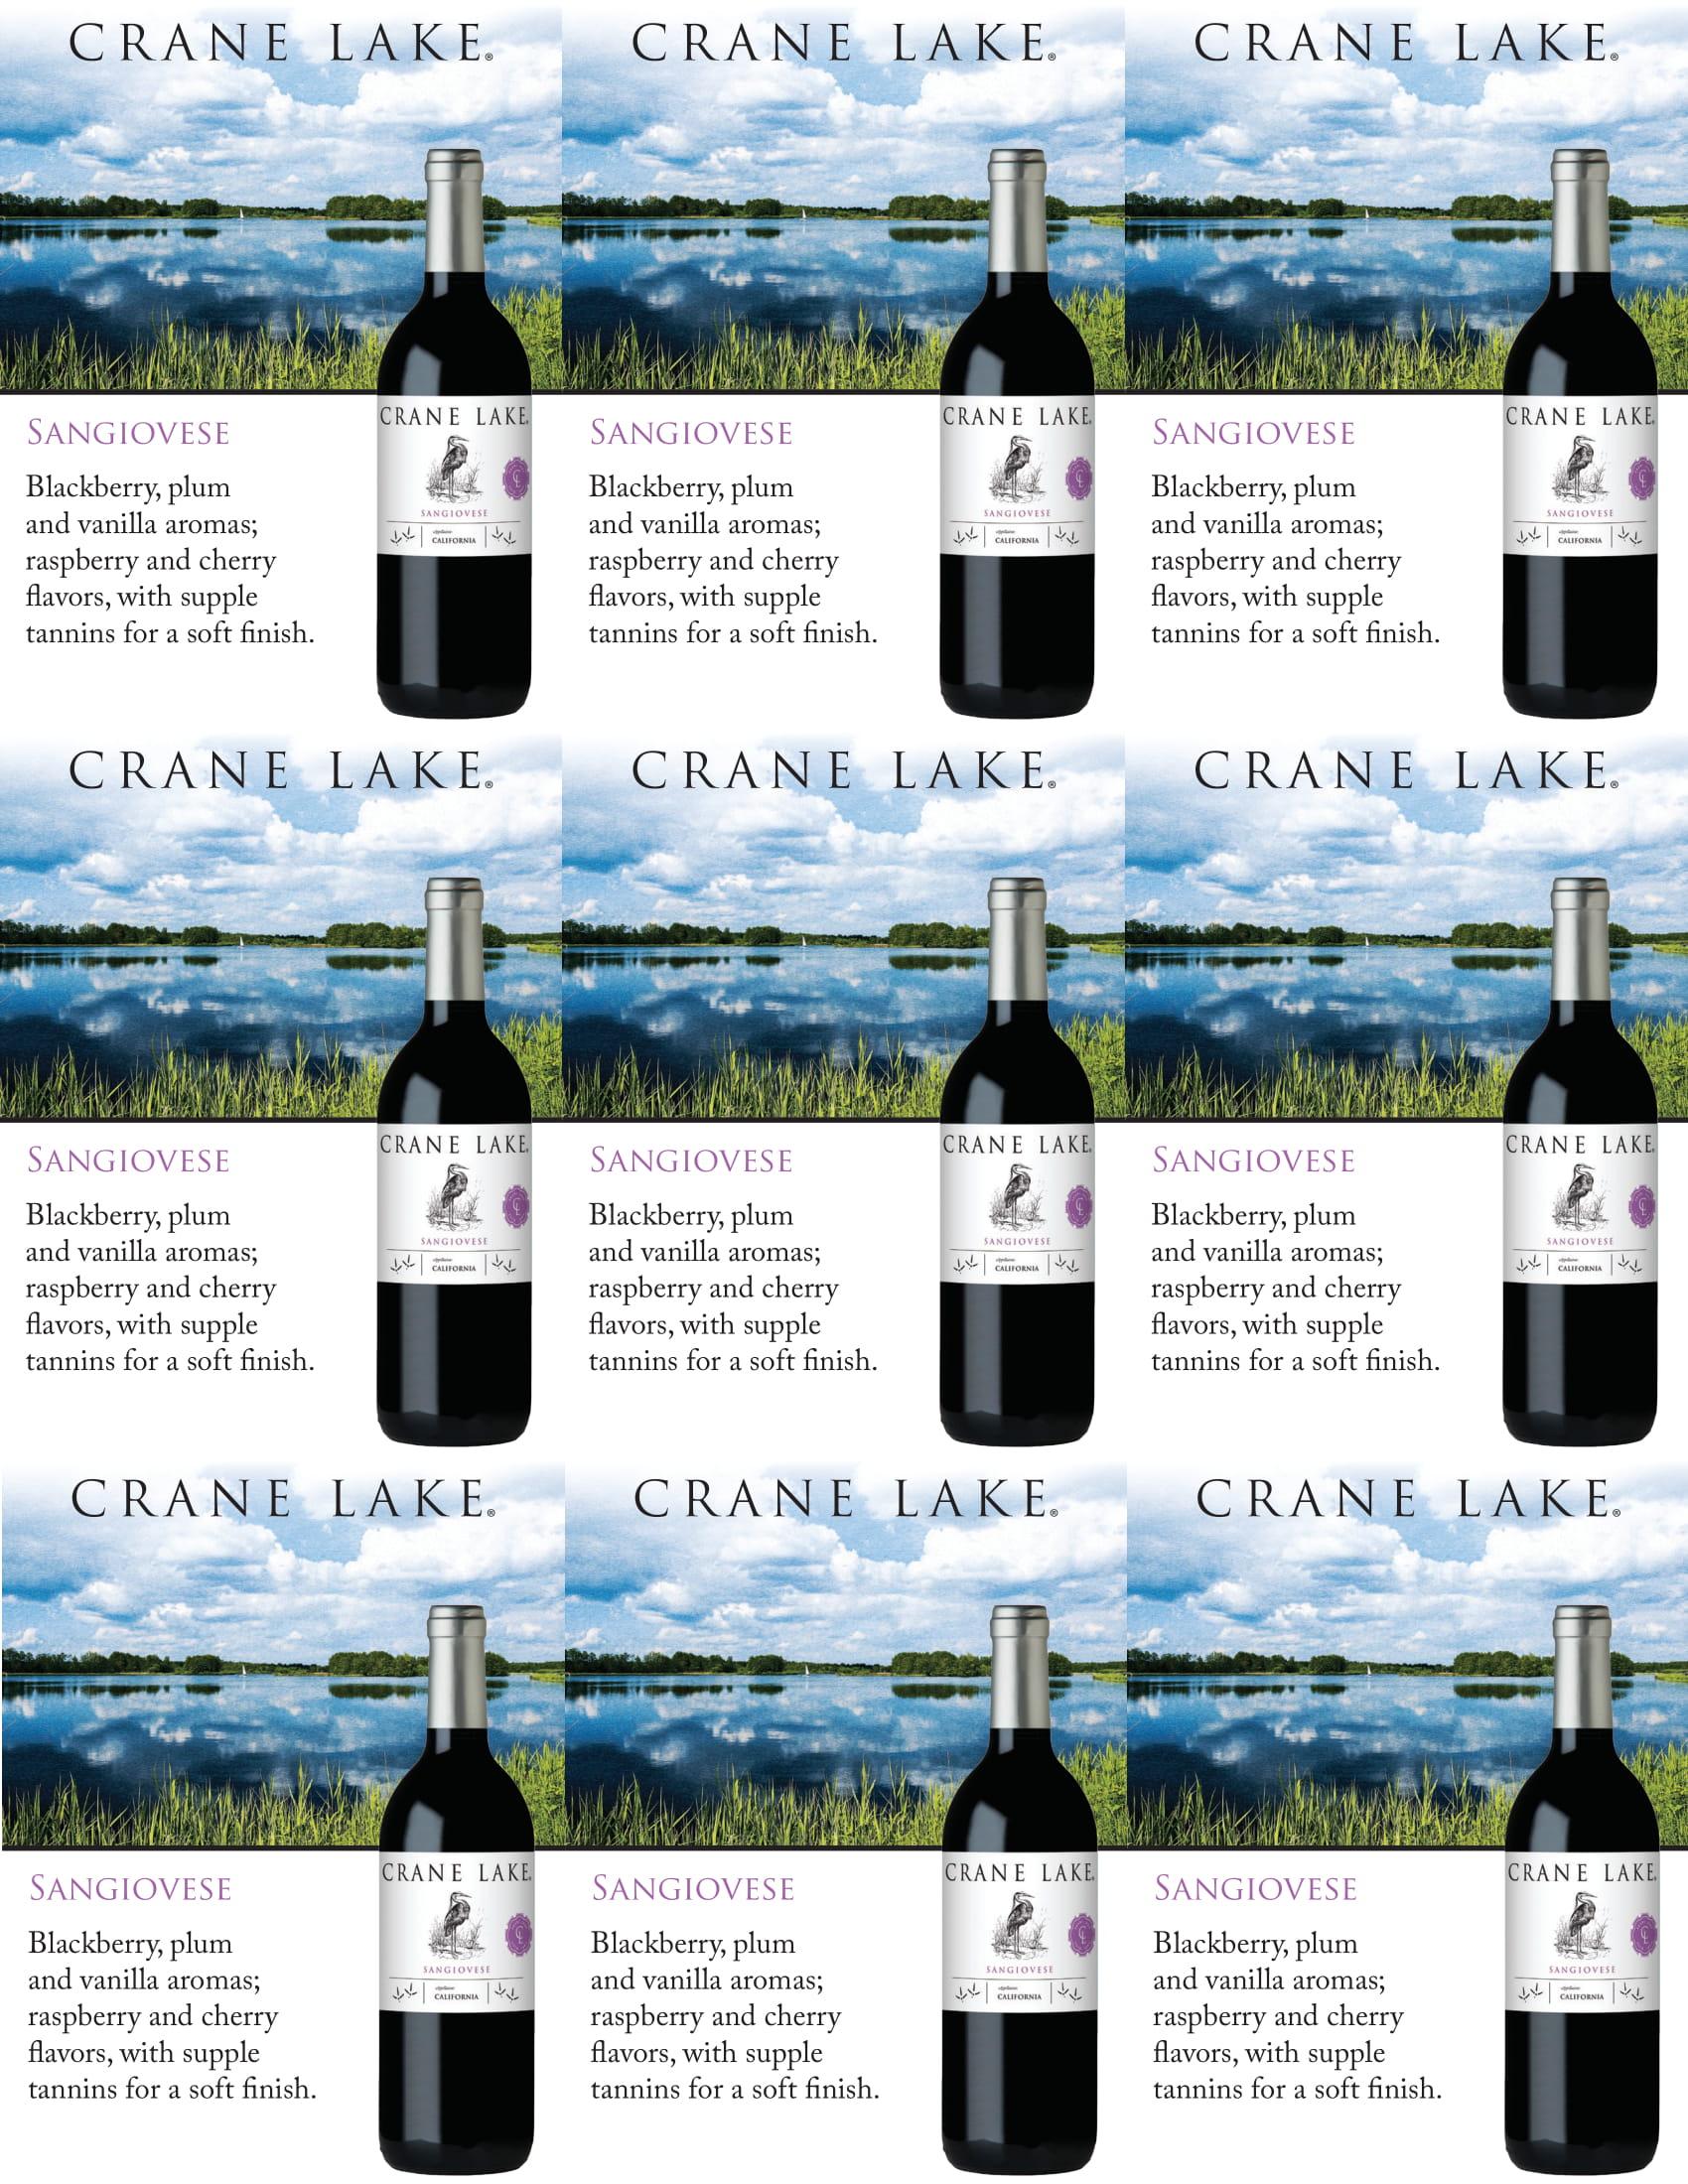 Crane Lake Sangiovese Shelf Talkers